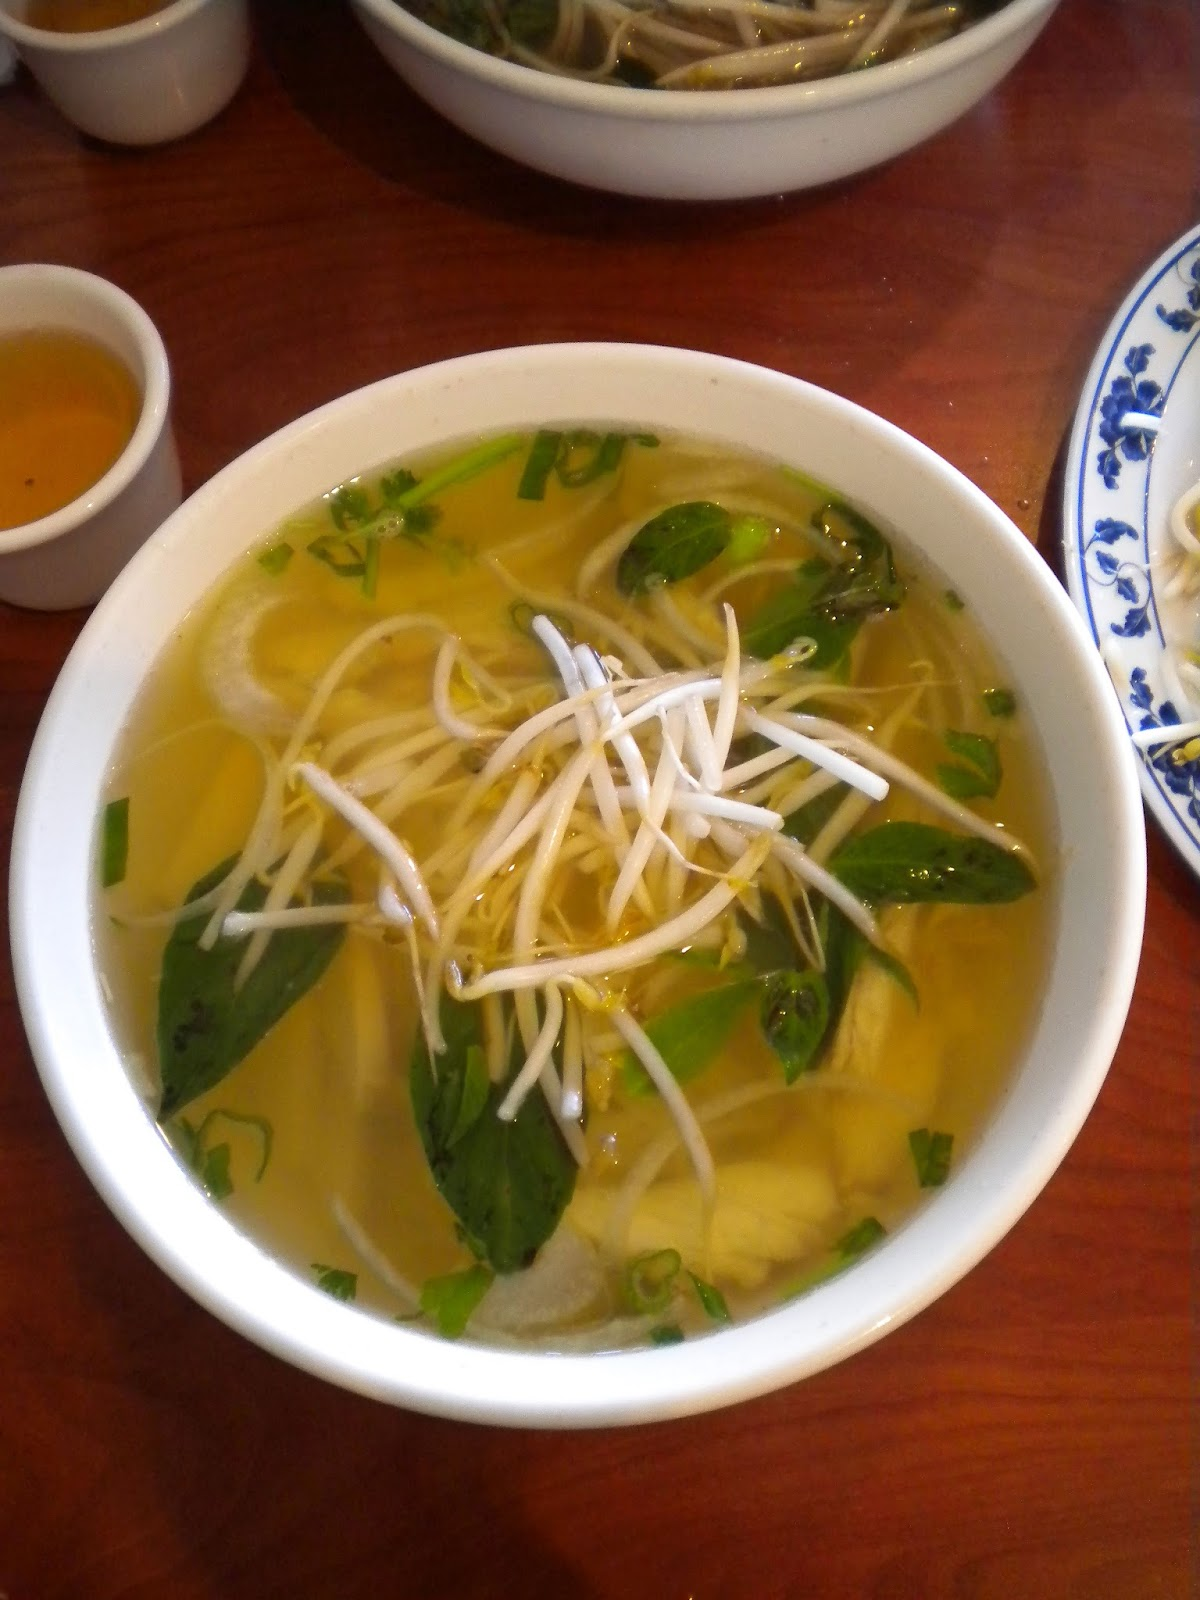 phokeitto pho soup kevin's noodle house san francisco california matkailu matkajuttu blogi mallaspulla ravintola